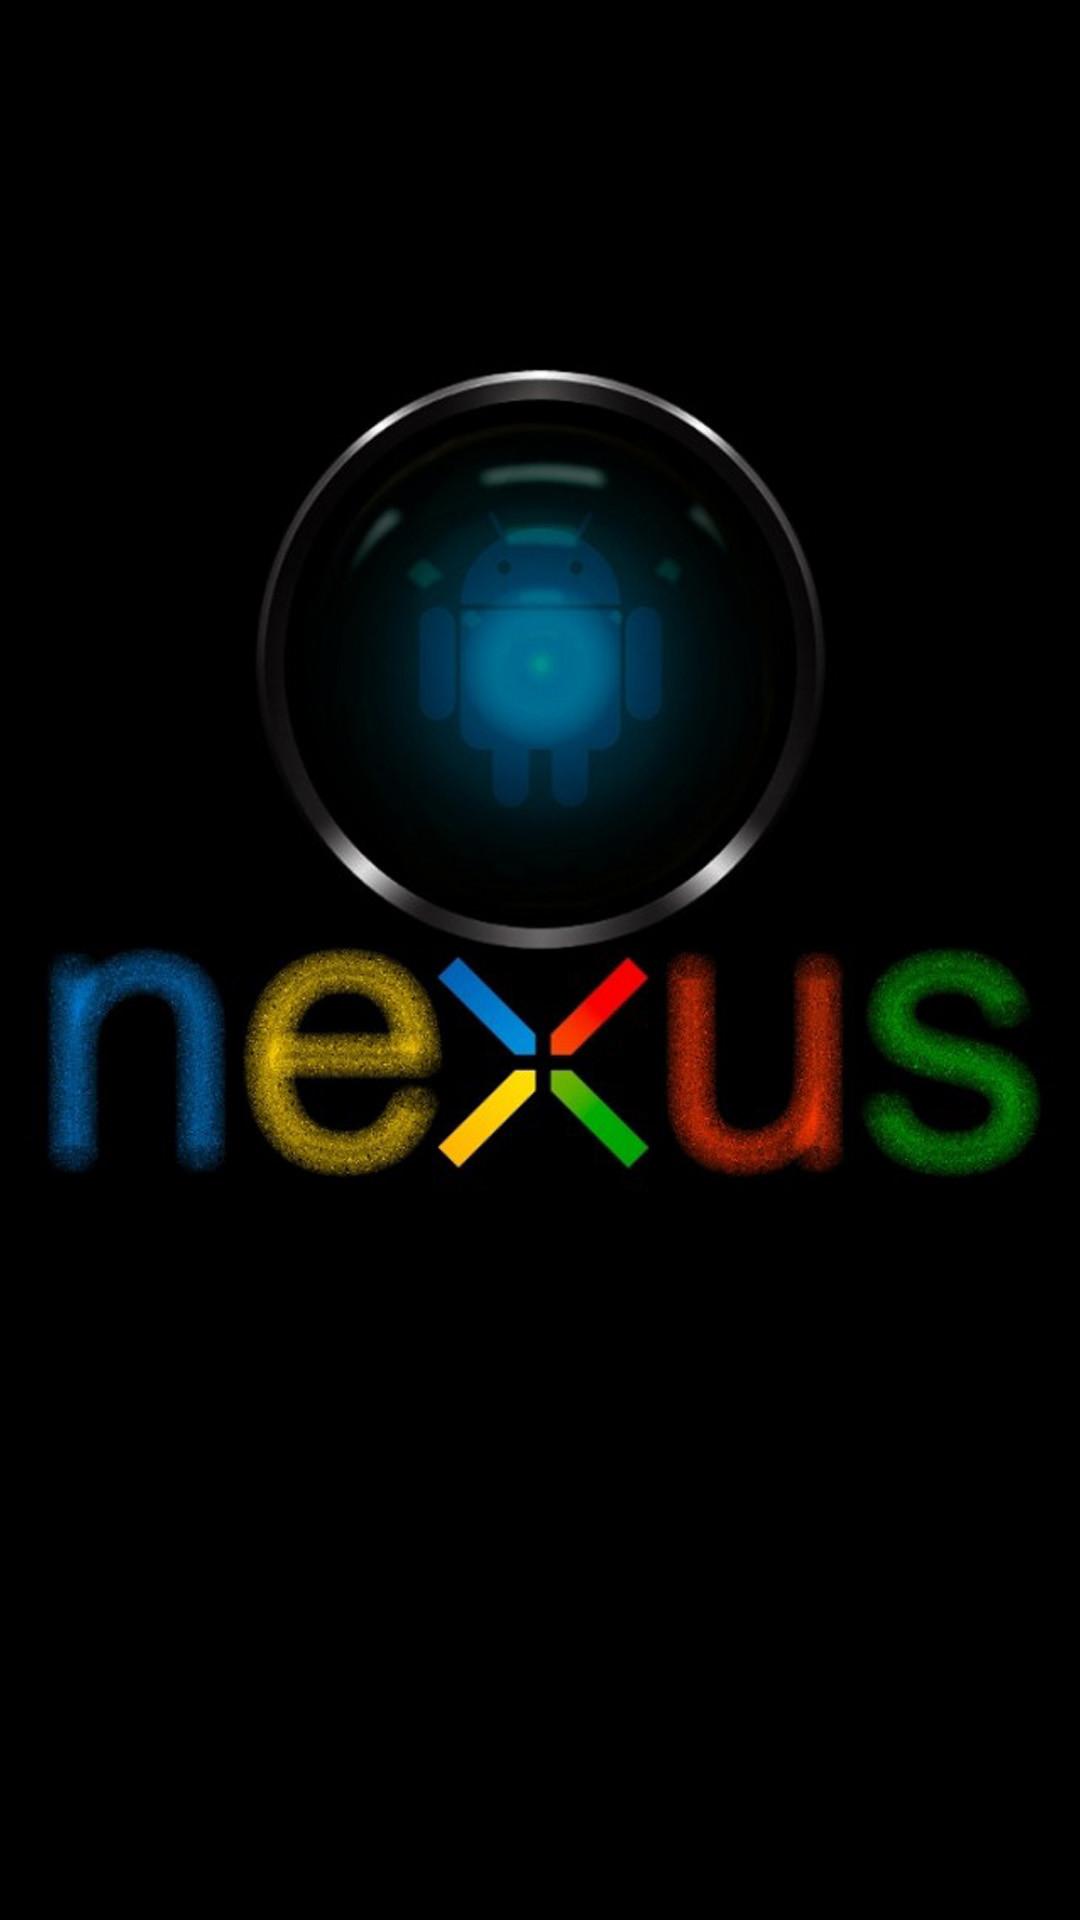 1080x1920 android nexus nexus 5 wallpapers a· download a· 2048x2048 ipad